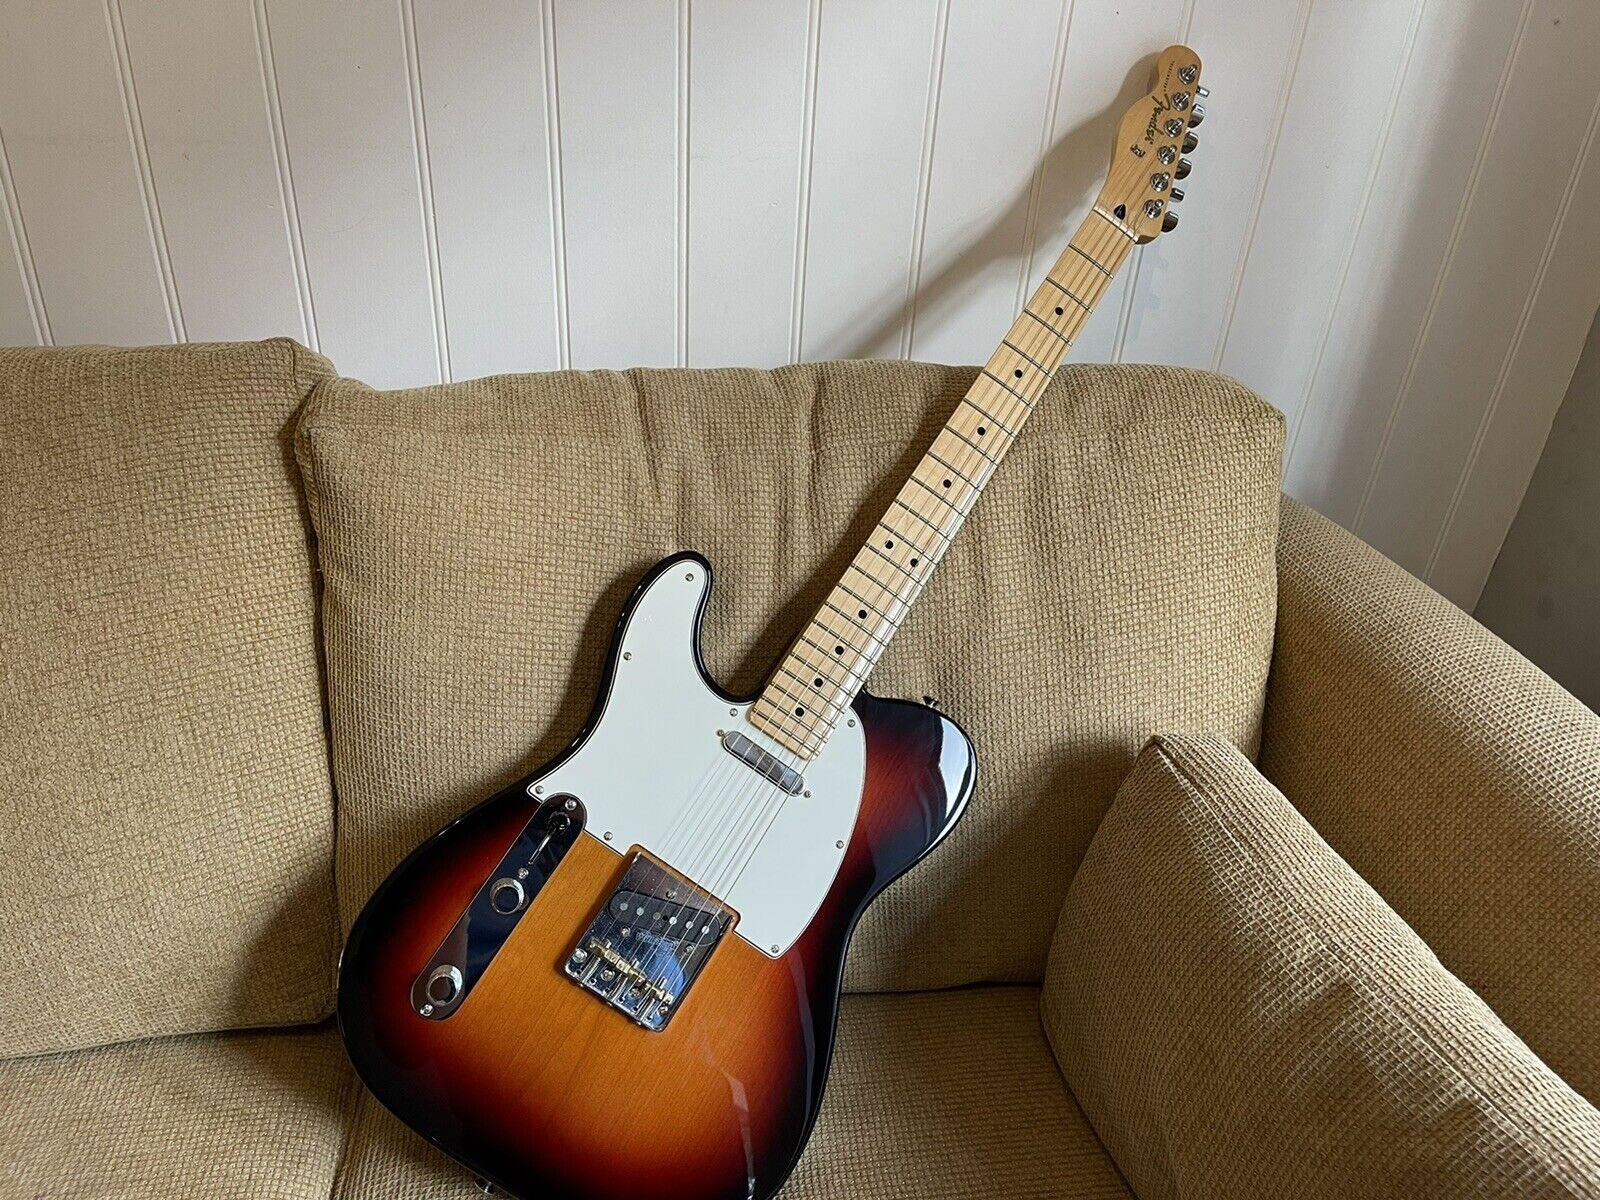 This pre-owned left handed Fender Telecaster guitar is for sale - Fender Player Telecaster Left Handed With Upgraded Bridge & Saddles - Mint